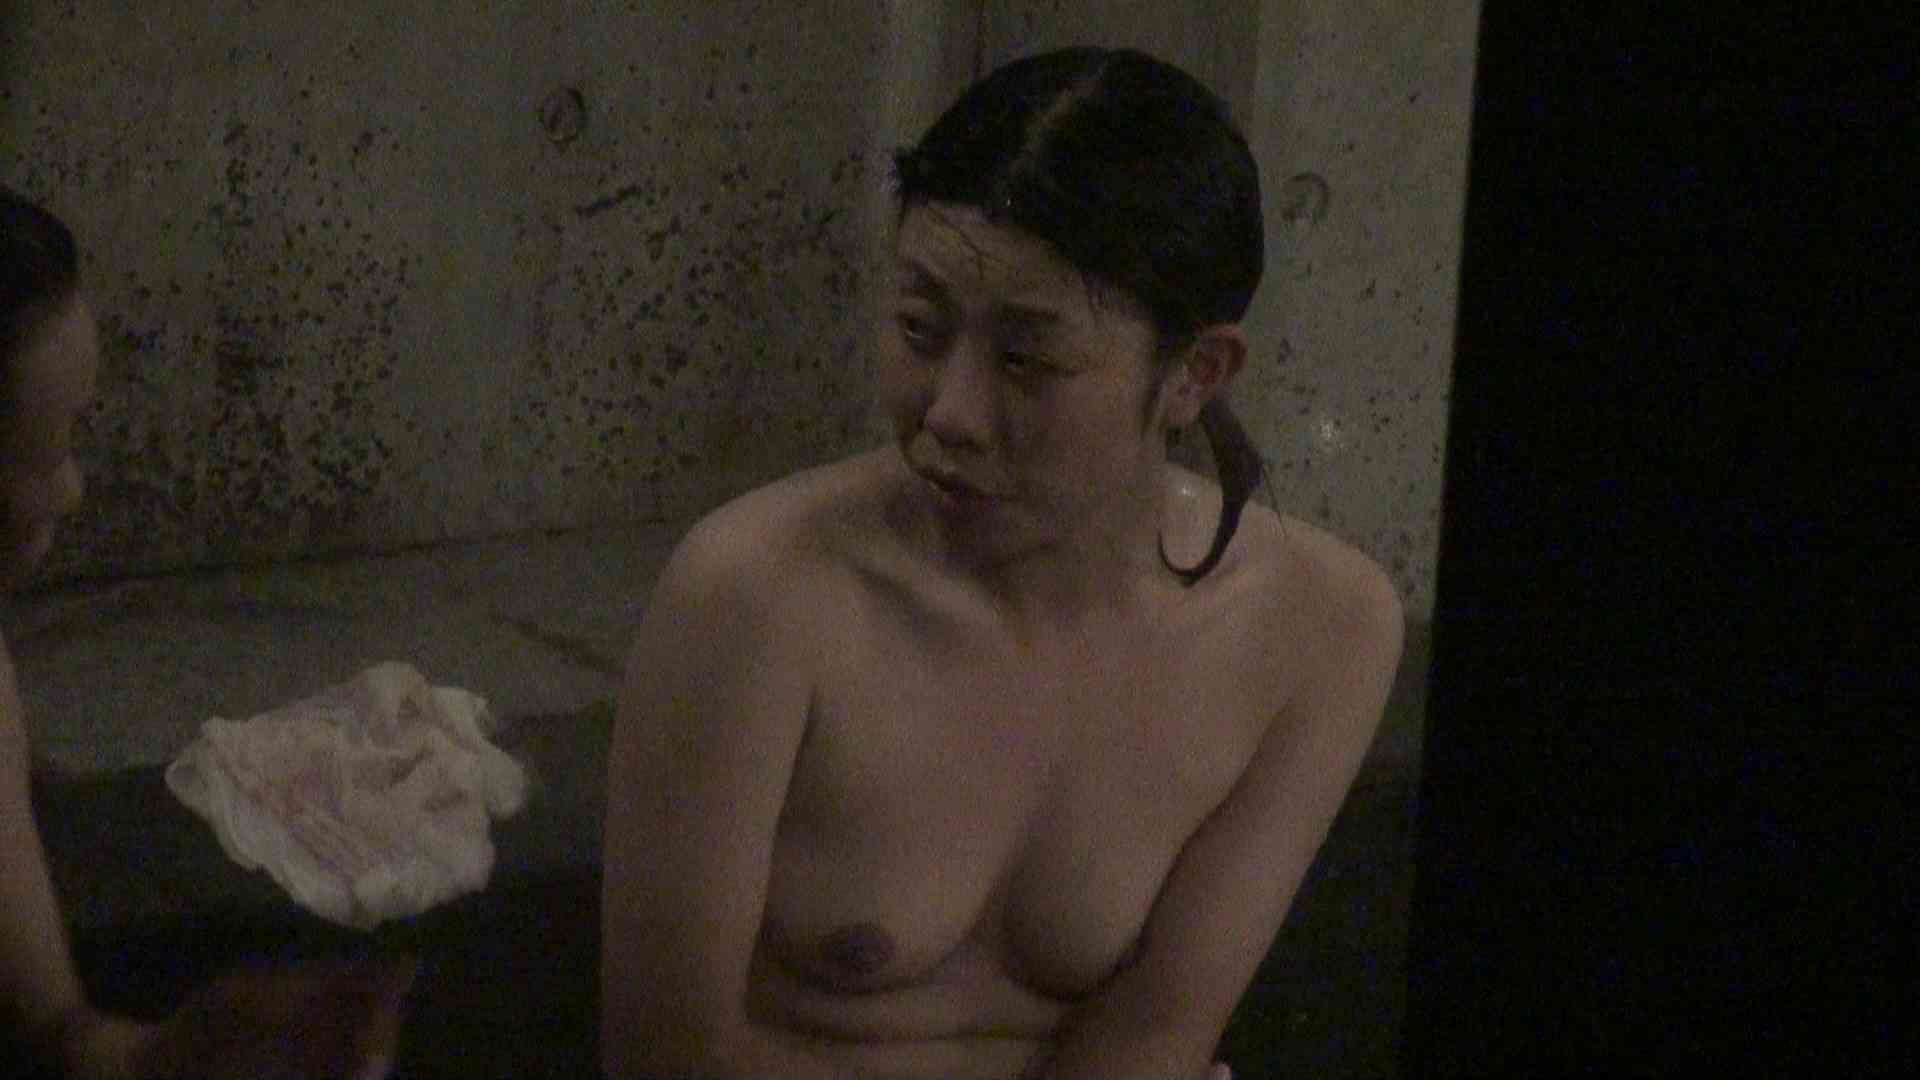 Aquaな露天風呂Vol.330 盗撮シリーズ   露天風呂編  78PIX 15